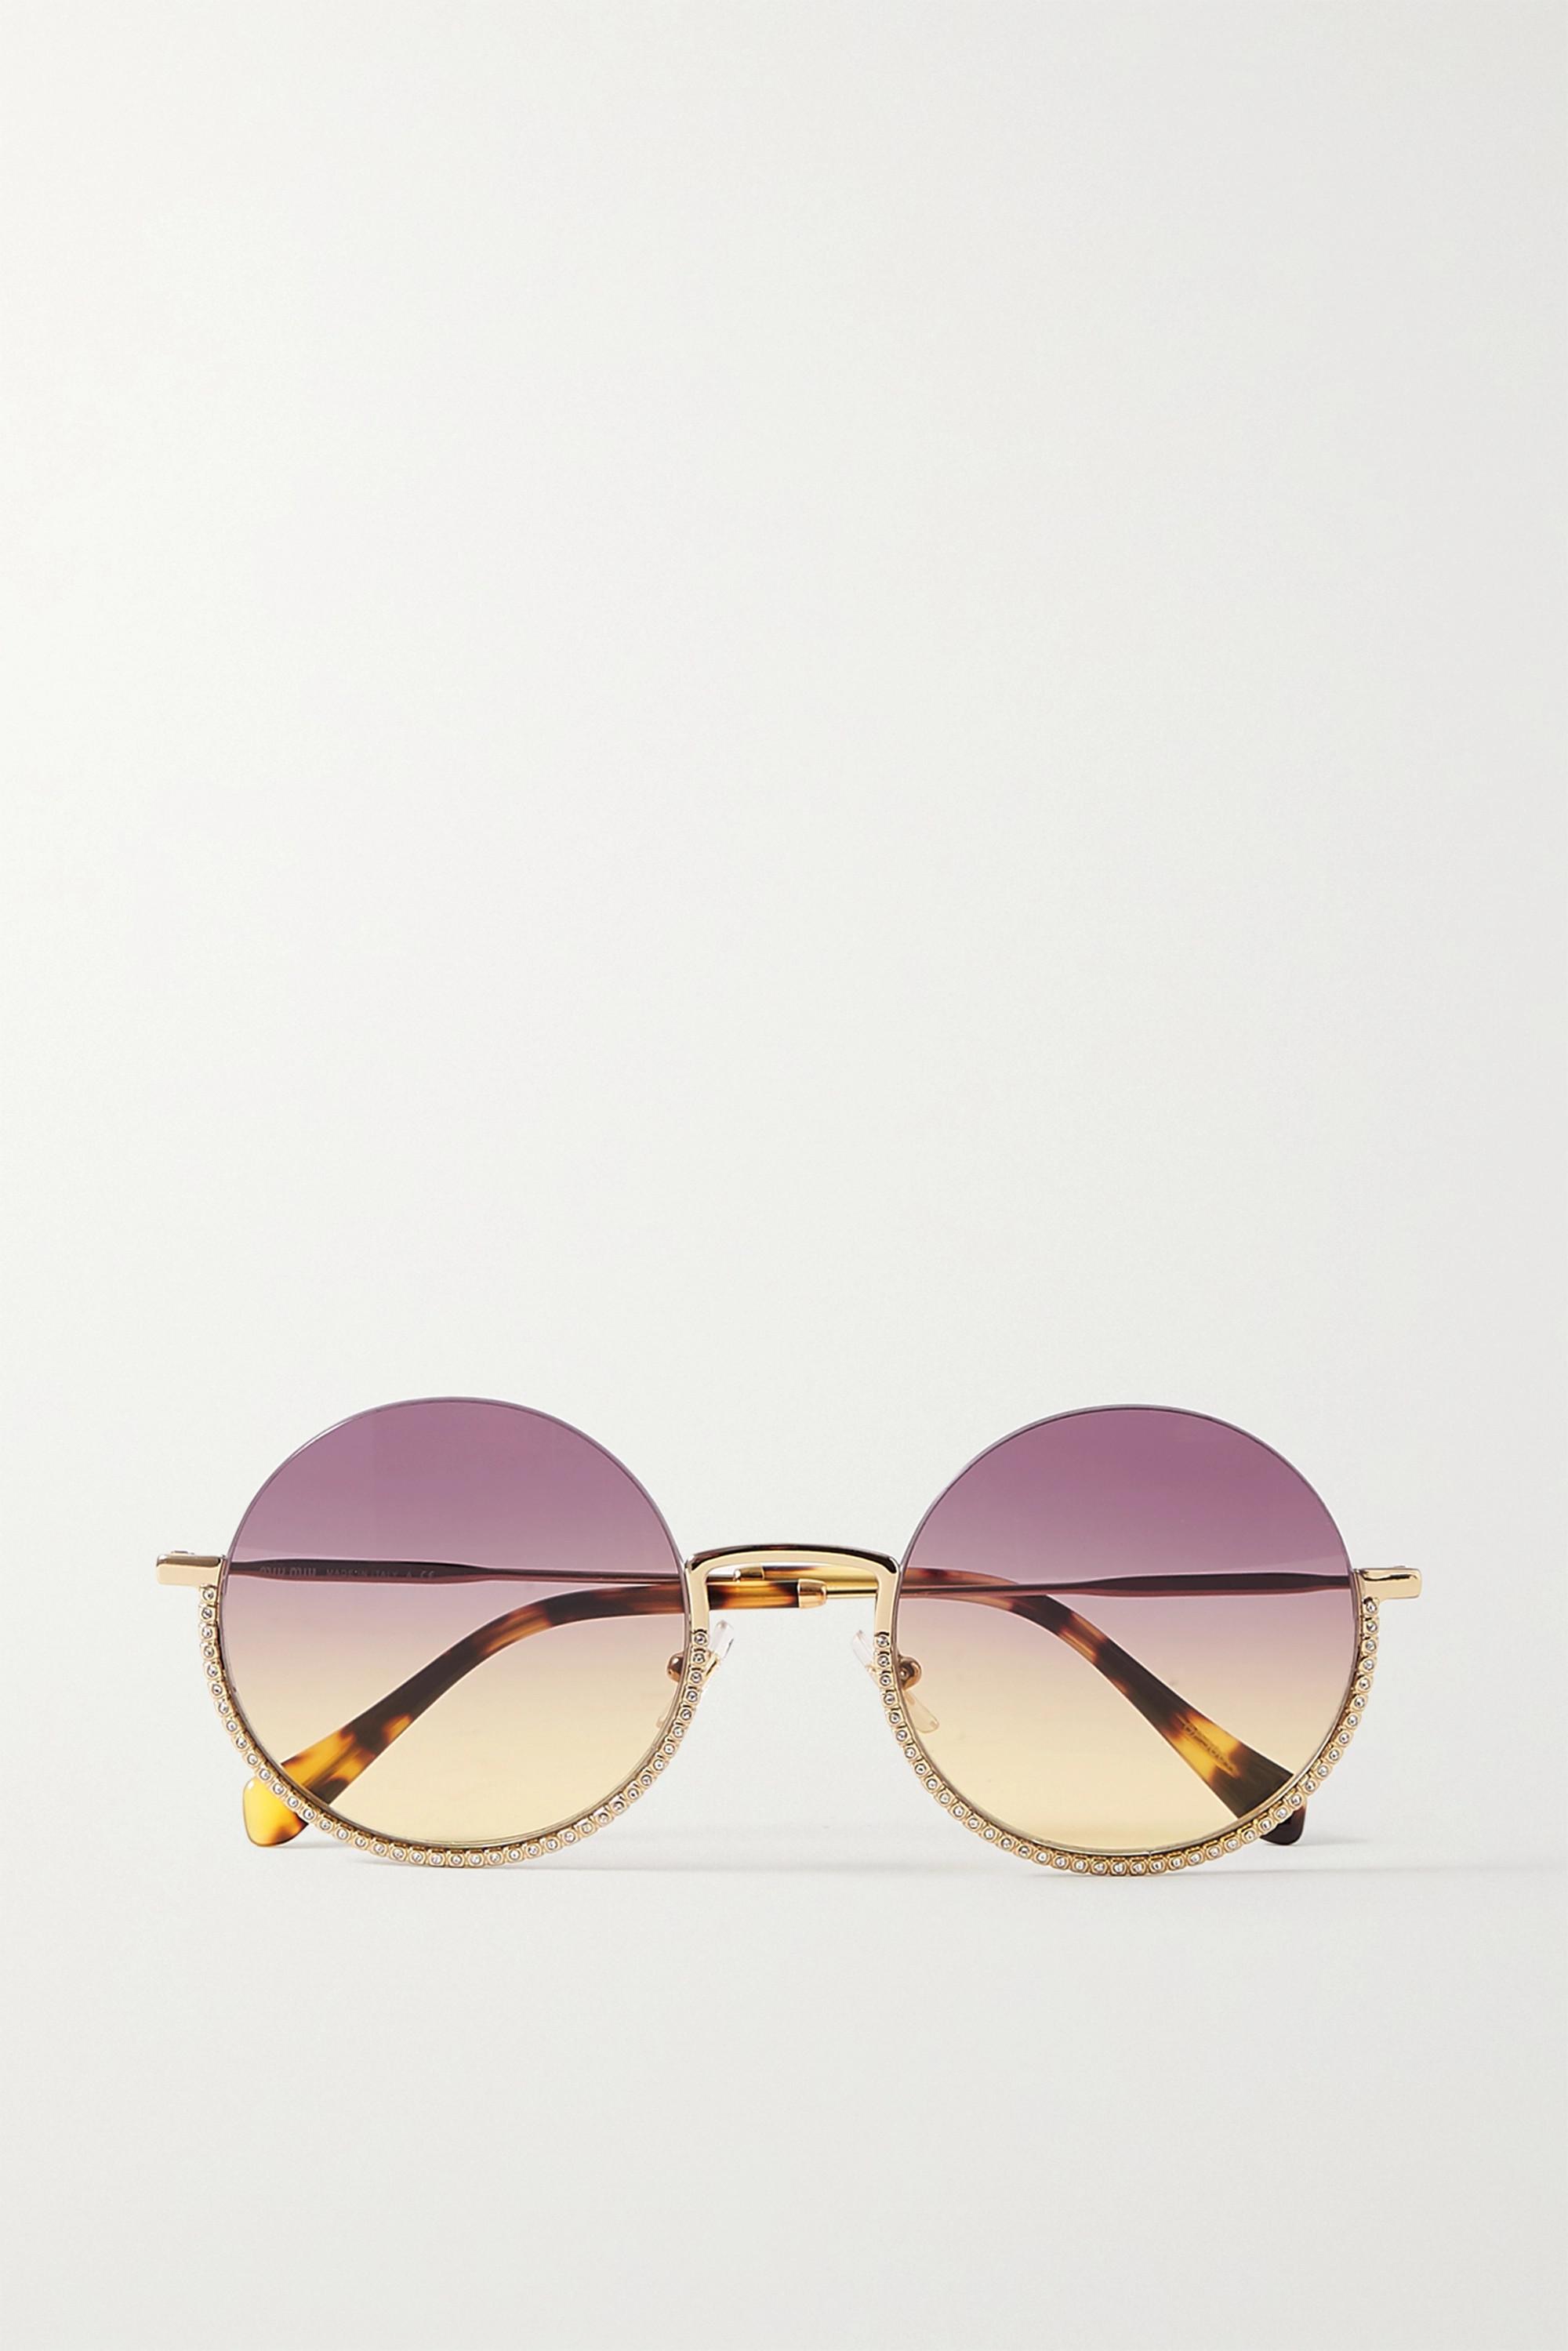 Miu Miu Eyewear Round-frame crystal-embellished gold-tone and tortoiseshell acetate sunglasses